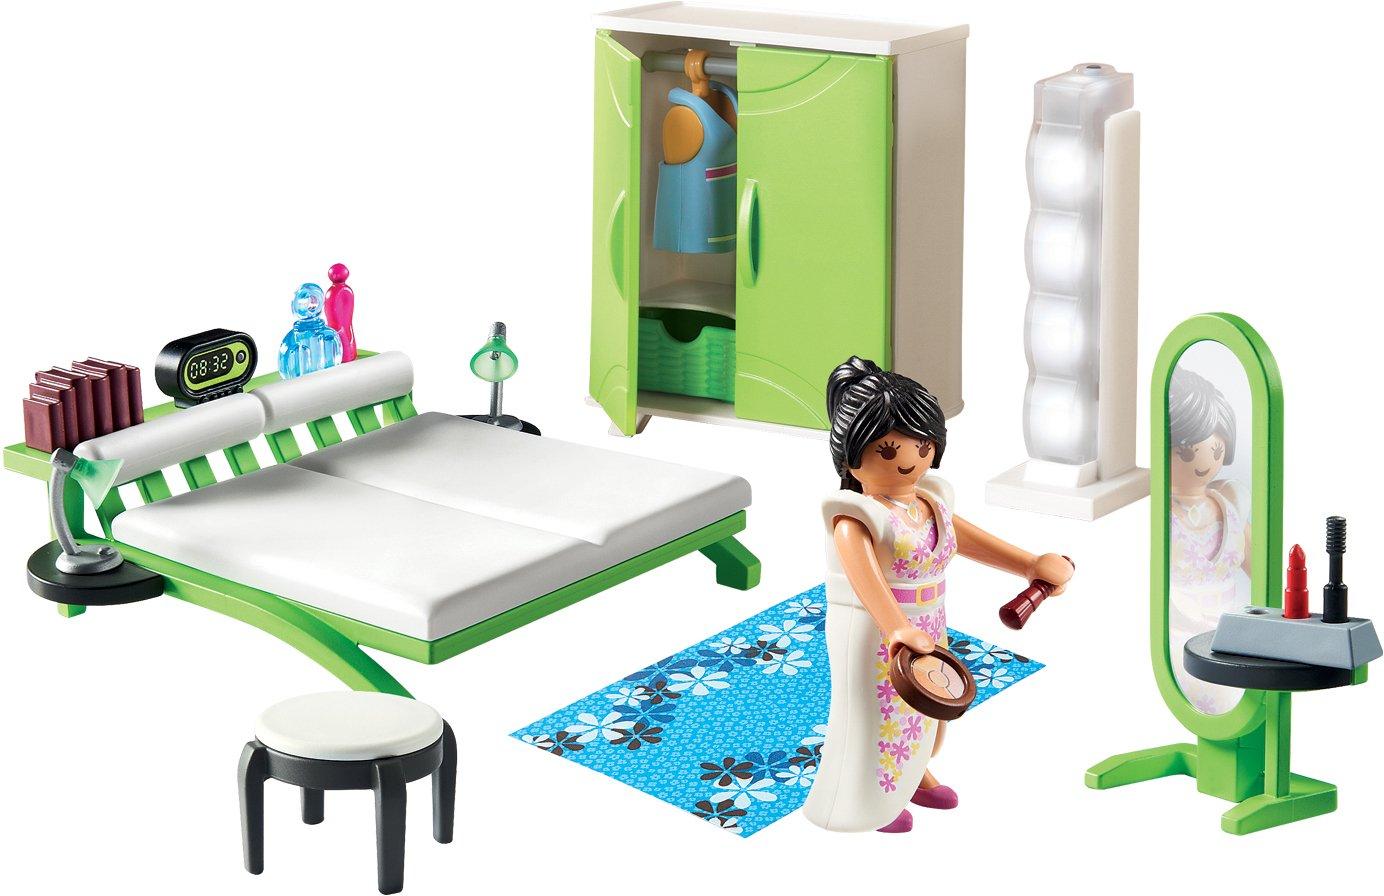 Playmobil 9271 City Life - Room: Amazon.co.uk: Toys & Games